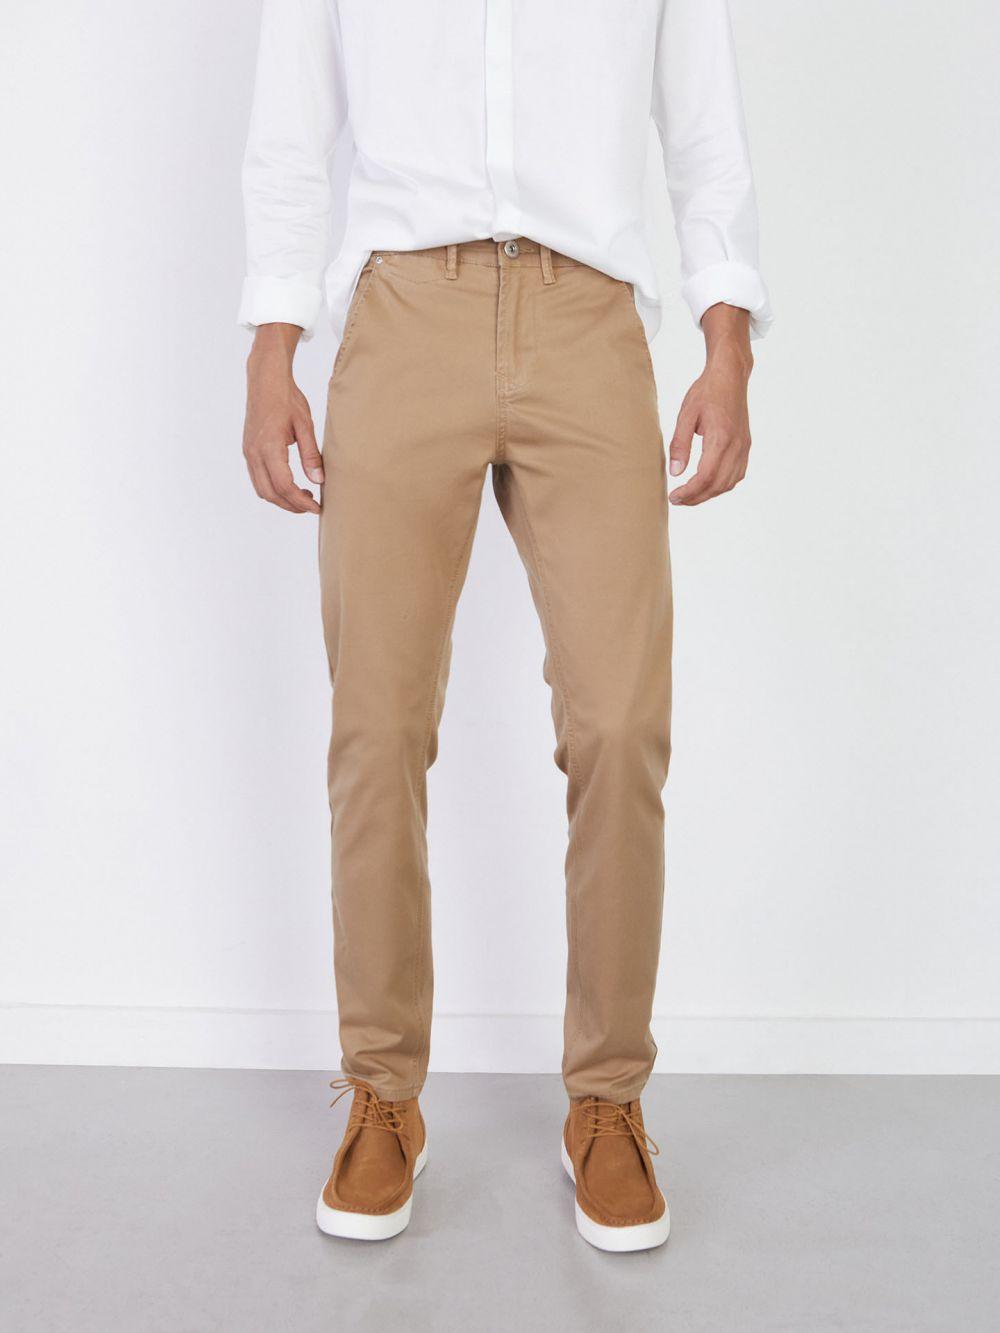 מכנס צ'ינו במראה מכובס